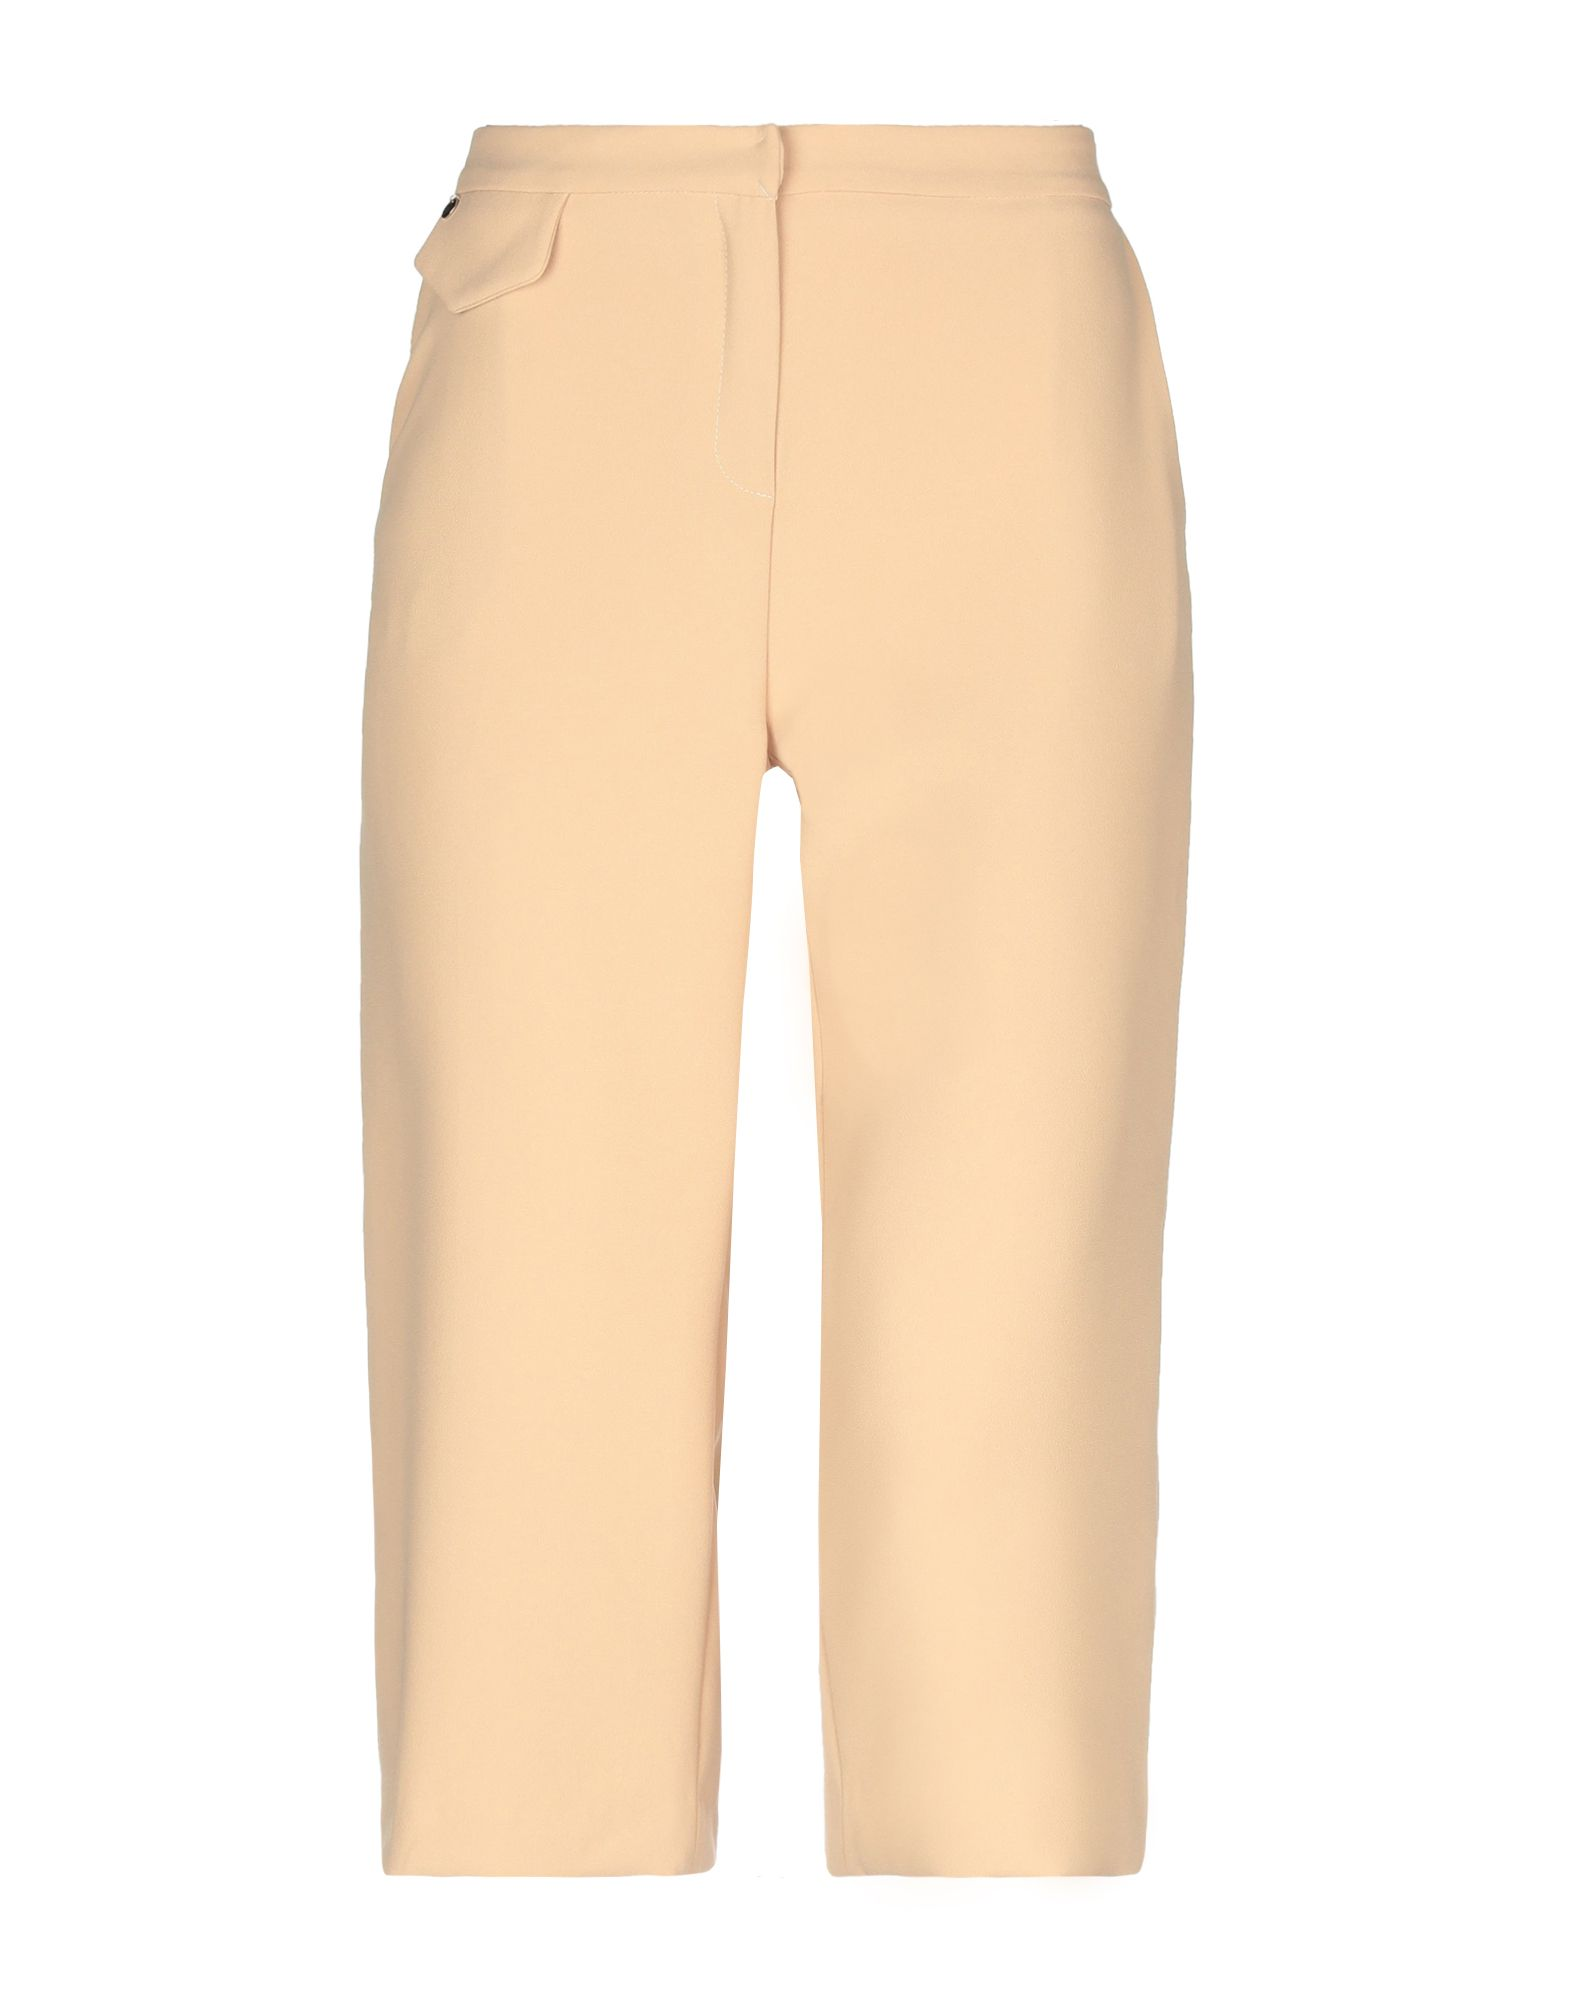 BETTY BLUE Брюки-капри blue joint брюки капри